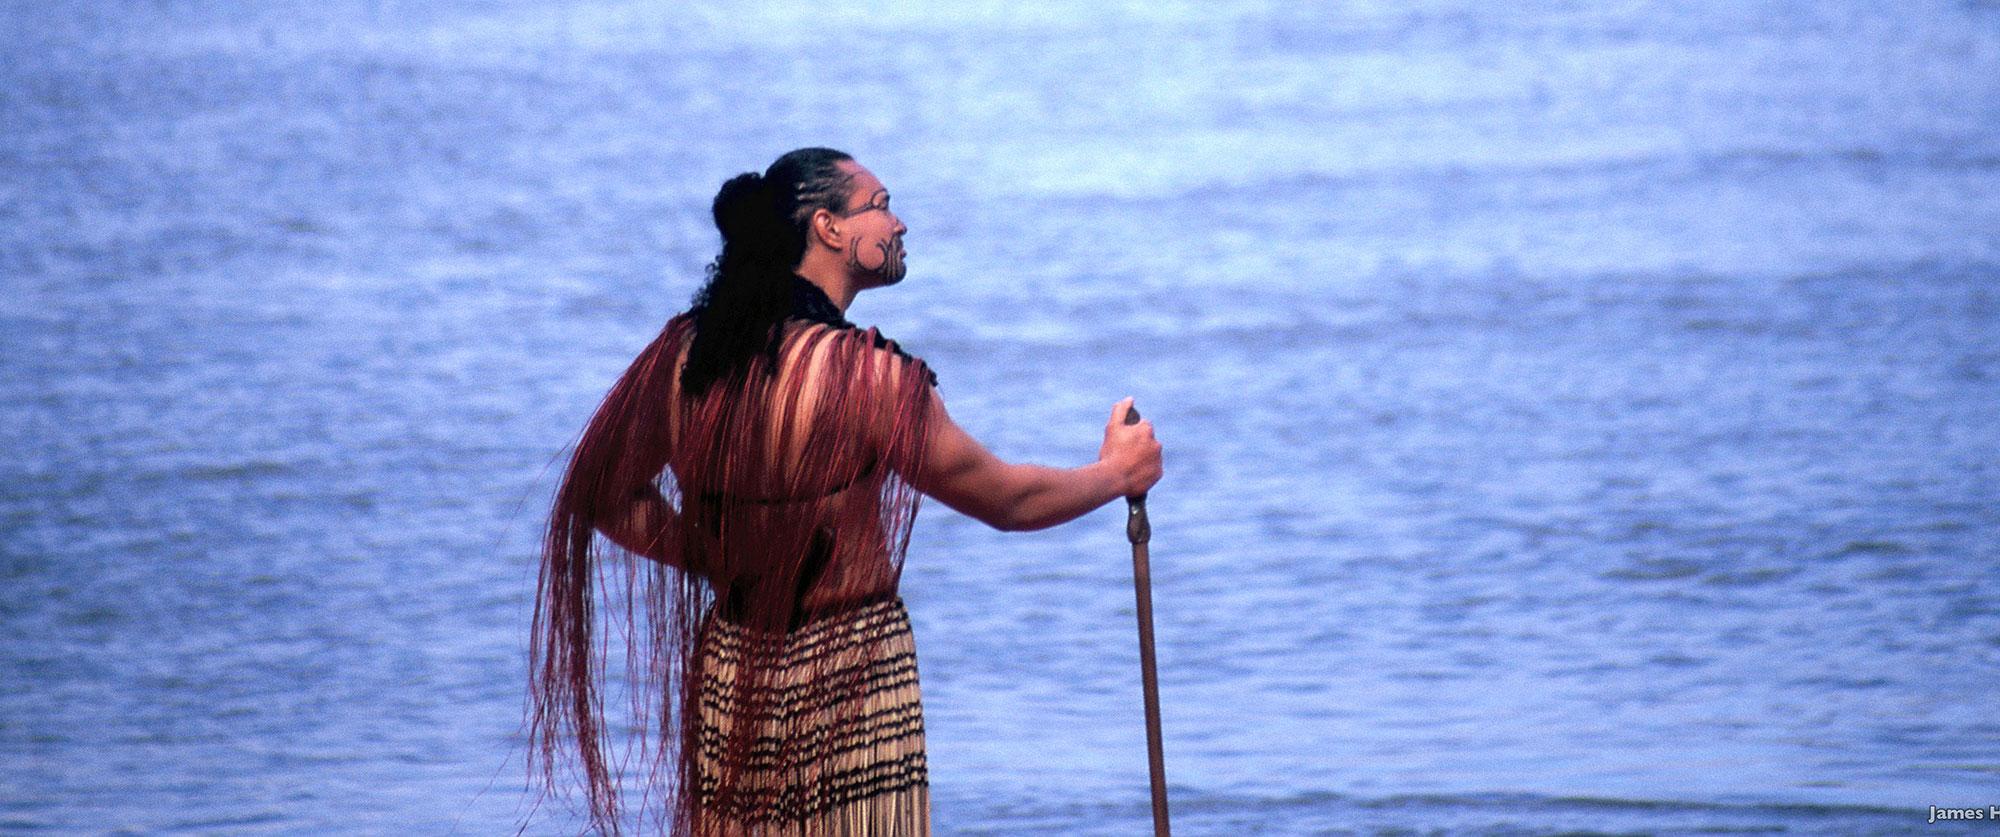 New Zealand Fiji Trip - Maori Tour - Culture - Unique Tour - New Zealand Fiji Package